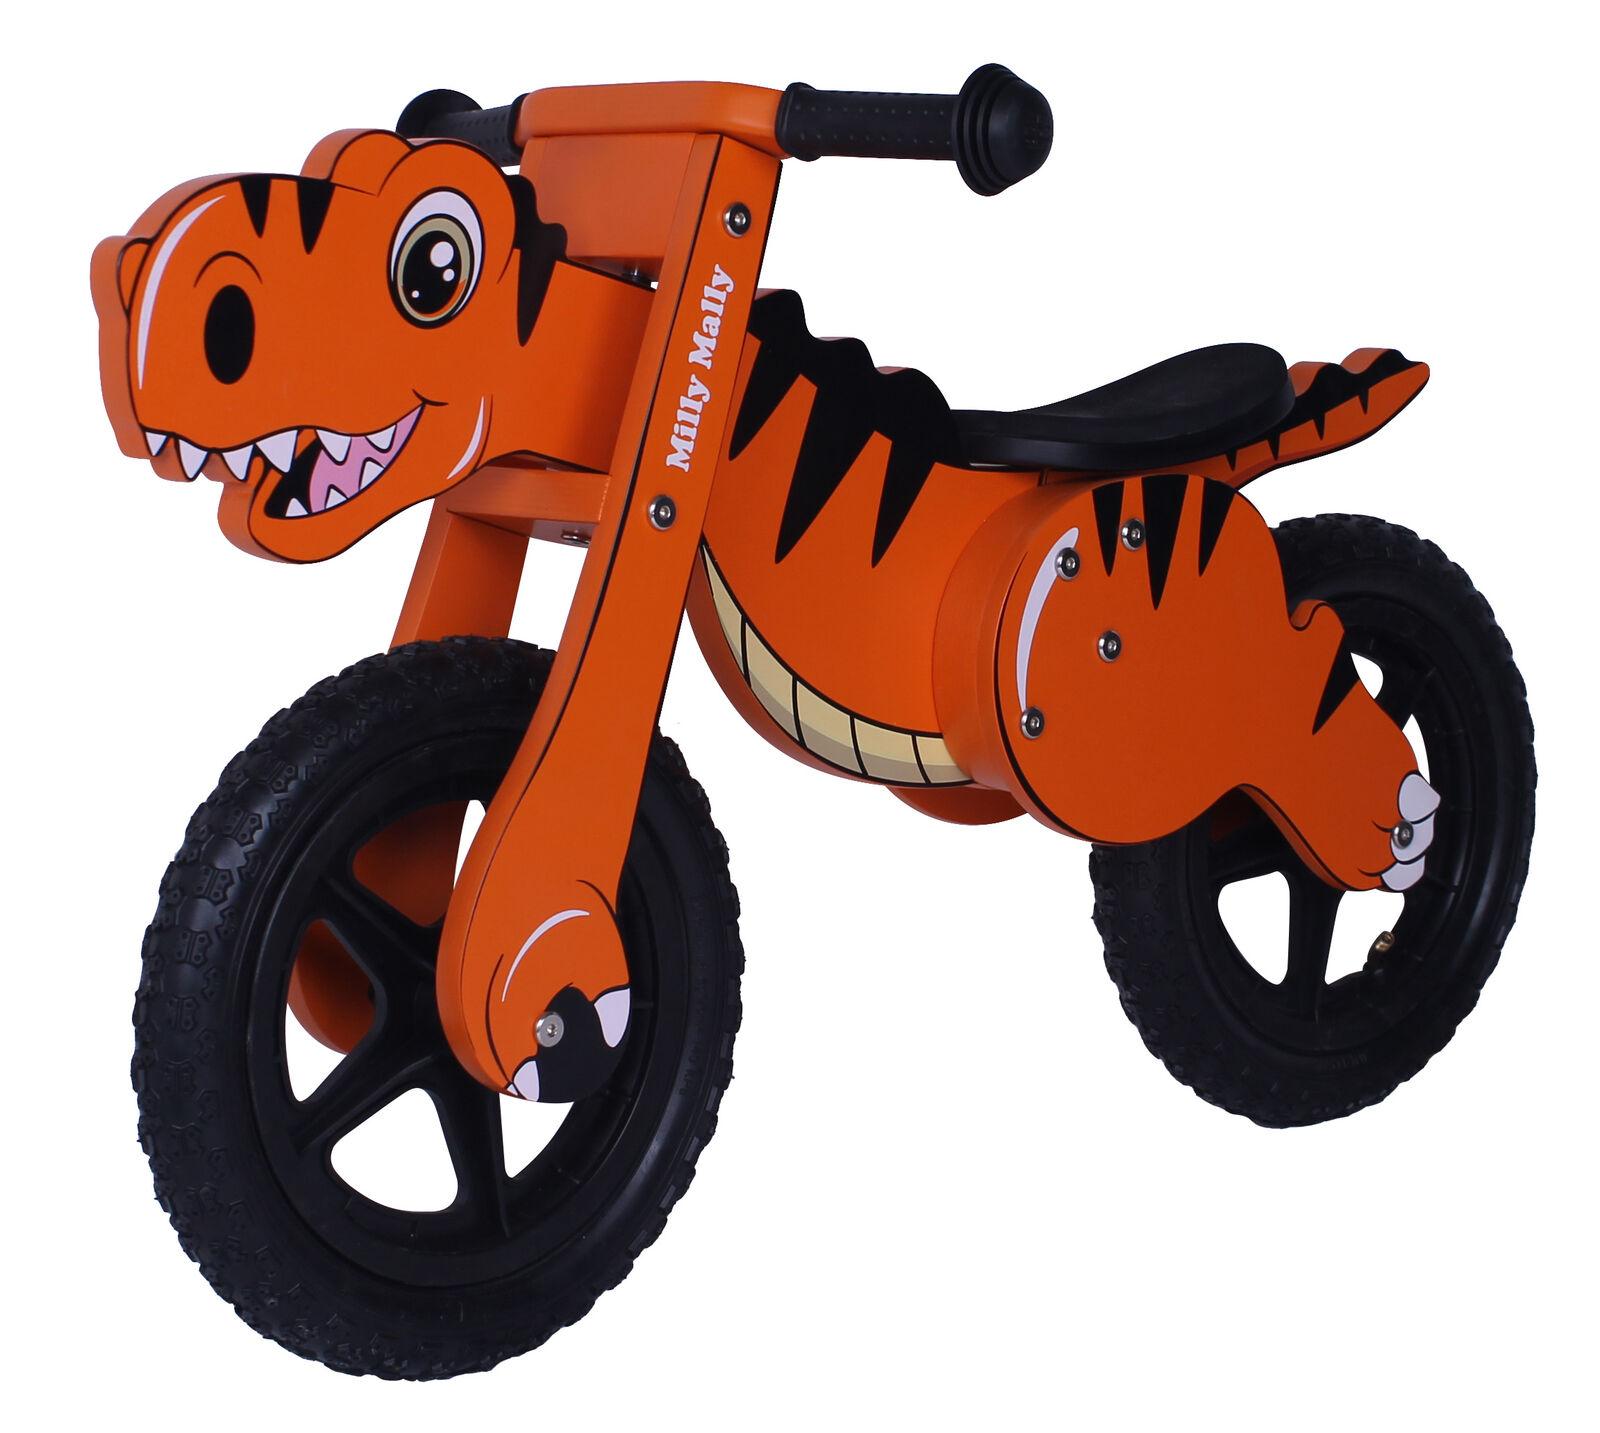 Laufrad DIN Orange Lernrad Kinderlaufrrad Lernlaufrad Holzlaufrad Kinderfahrrad